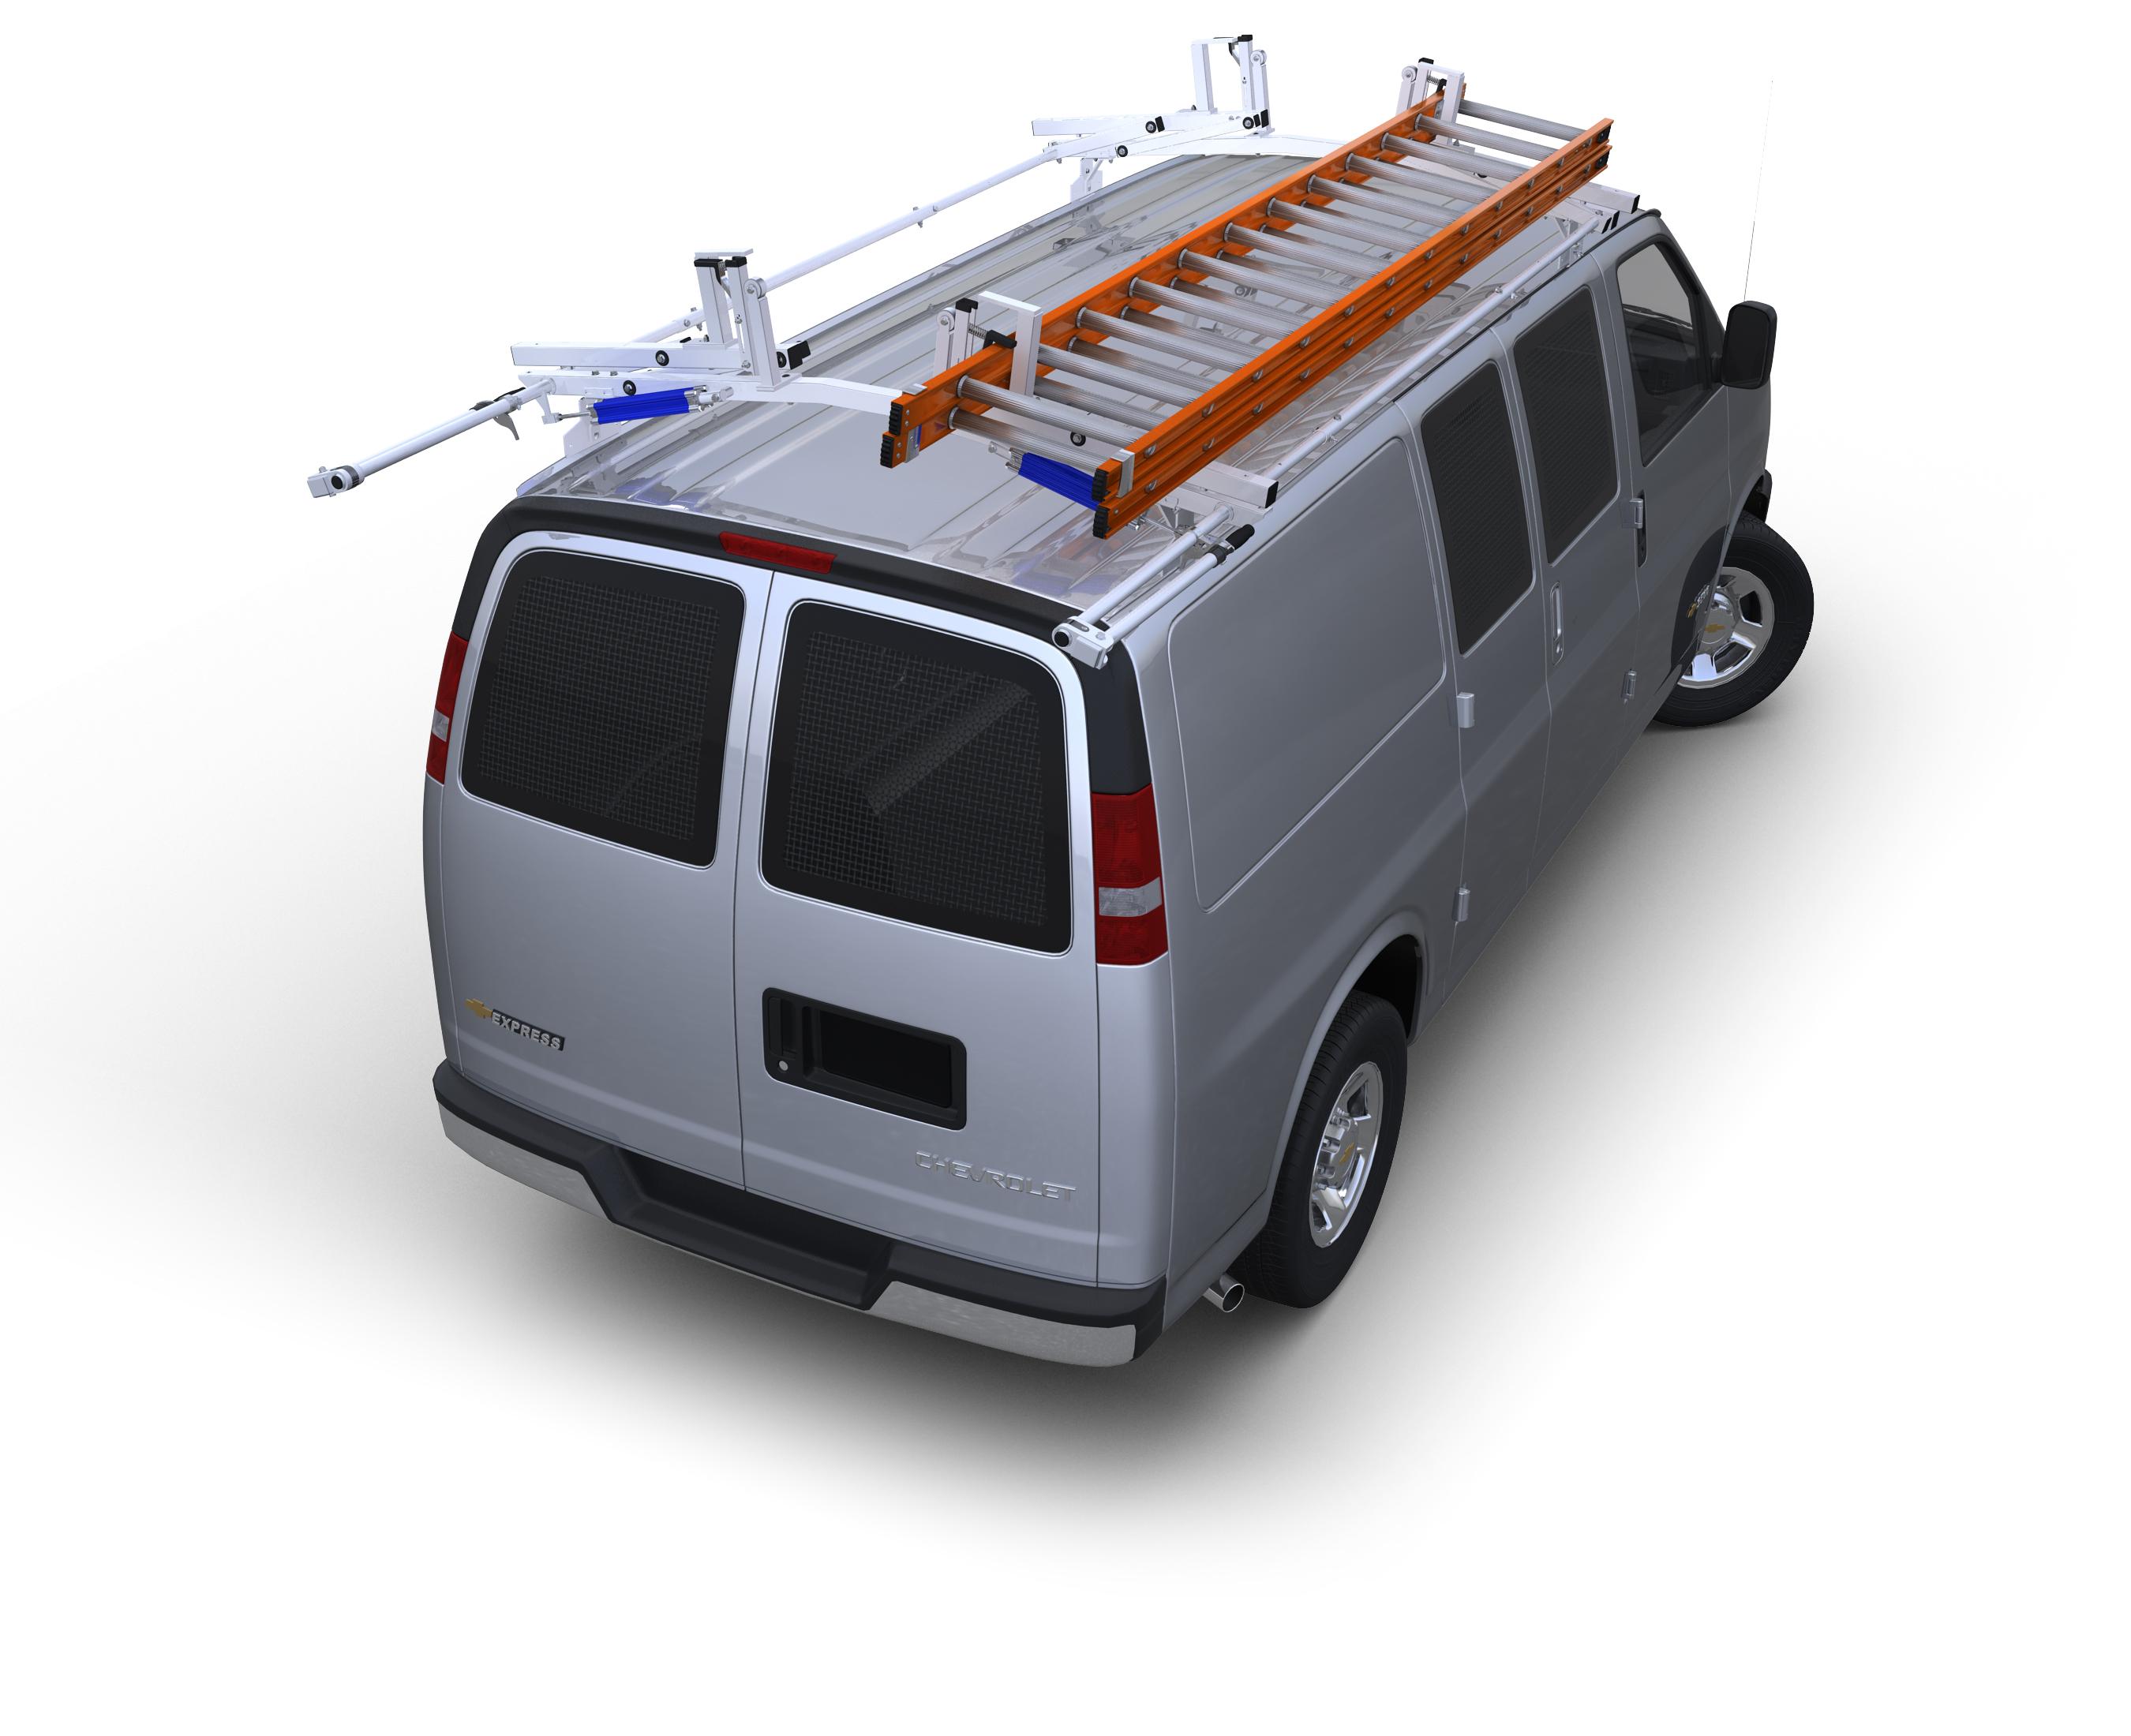 "MB Sprinter 144""WB Std. Roof Electrical Van Package, Aluminum Shelving - SAVE $175!"